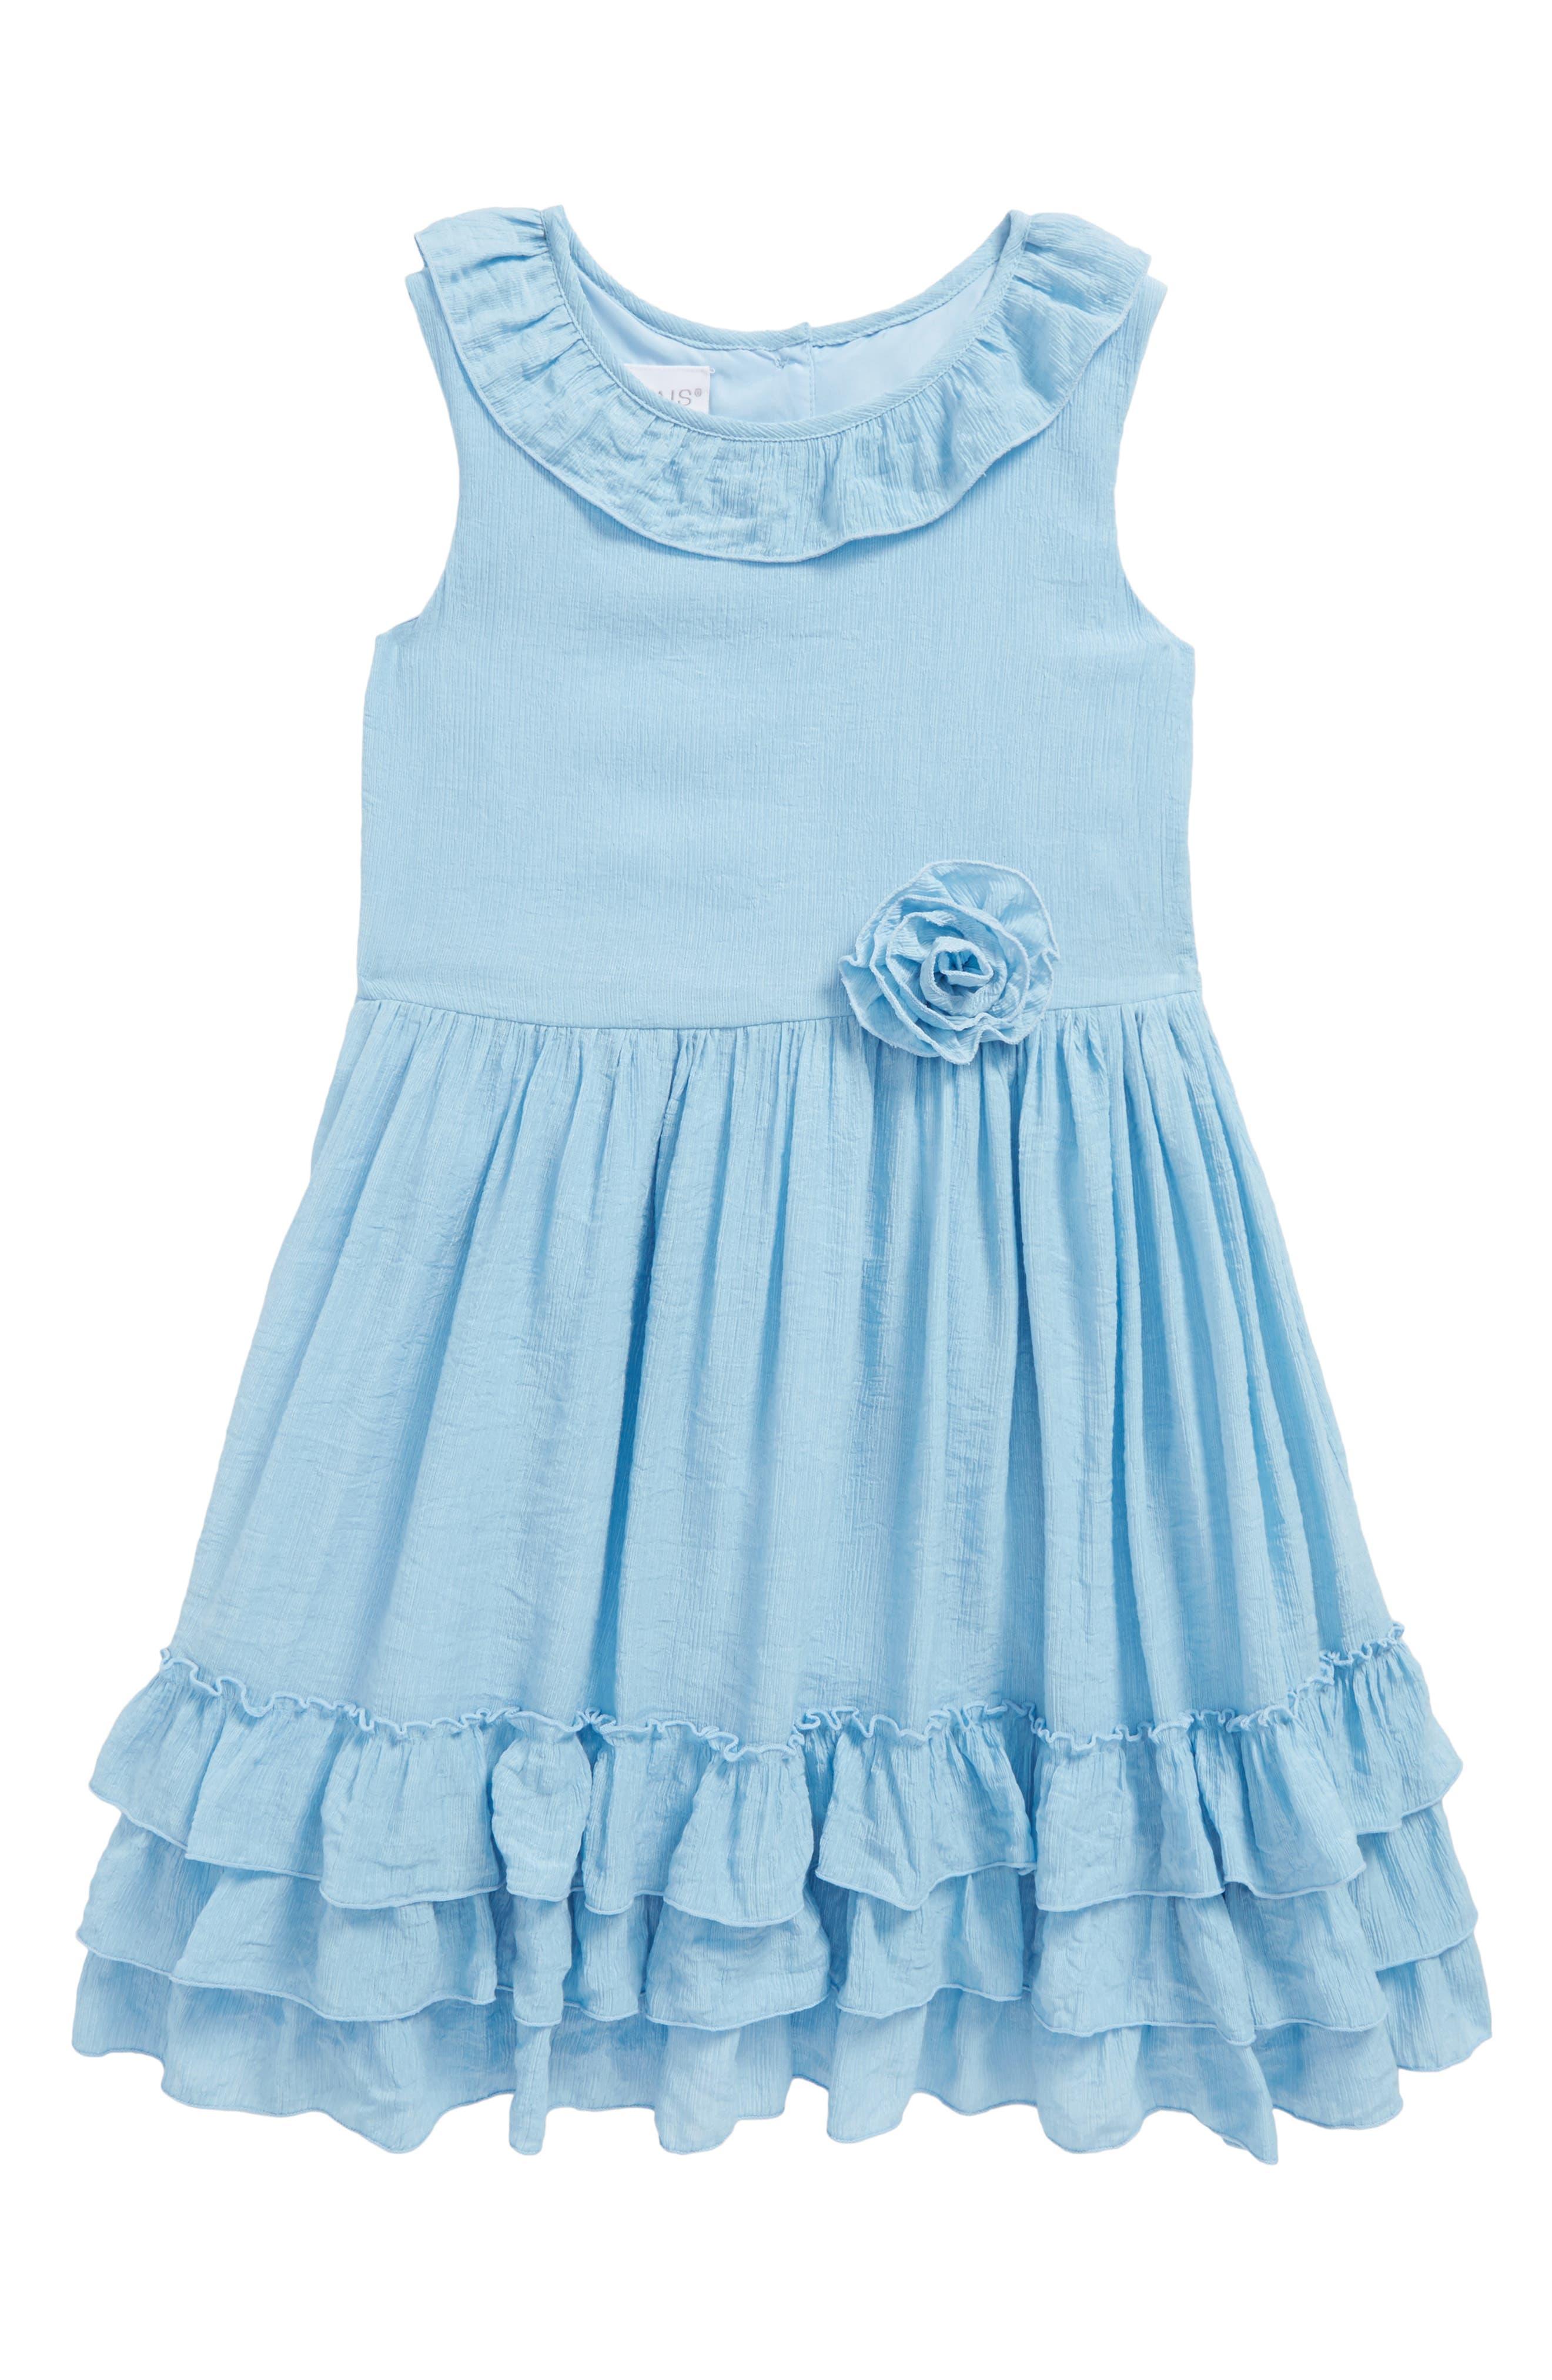 Ruffle Dress,                             Main thumbnail 1, color,                             450